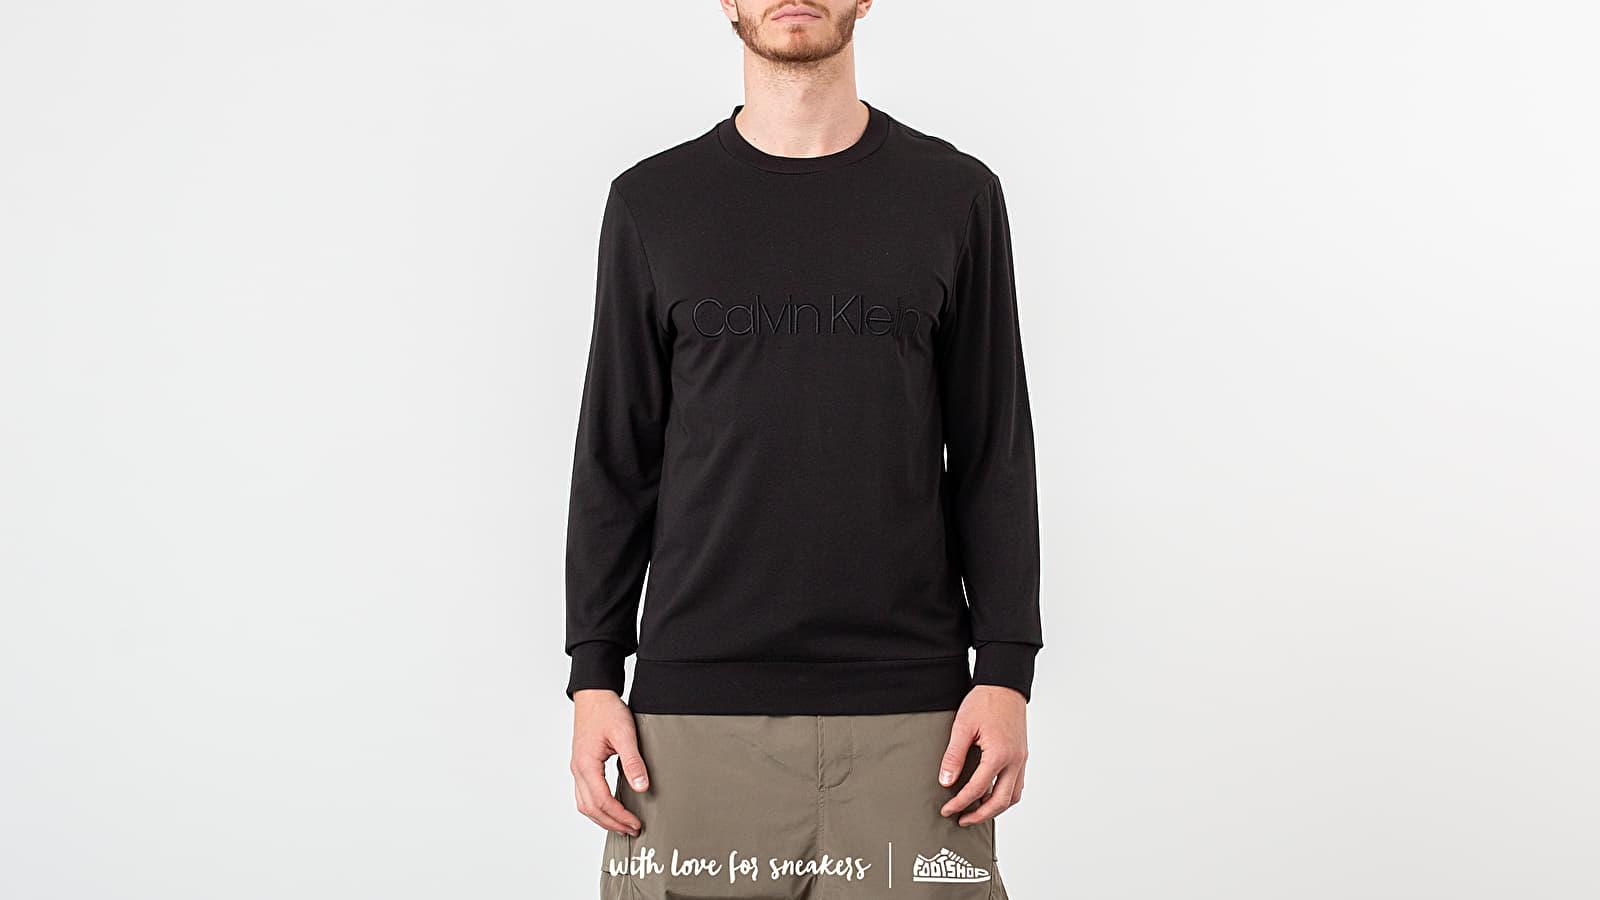 Calvin Klein L/S Sweatshirt Black at a great price 73 € buy at Footshop